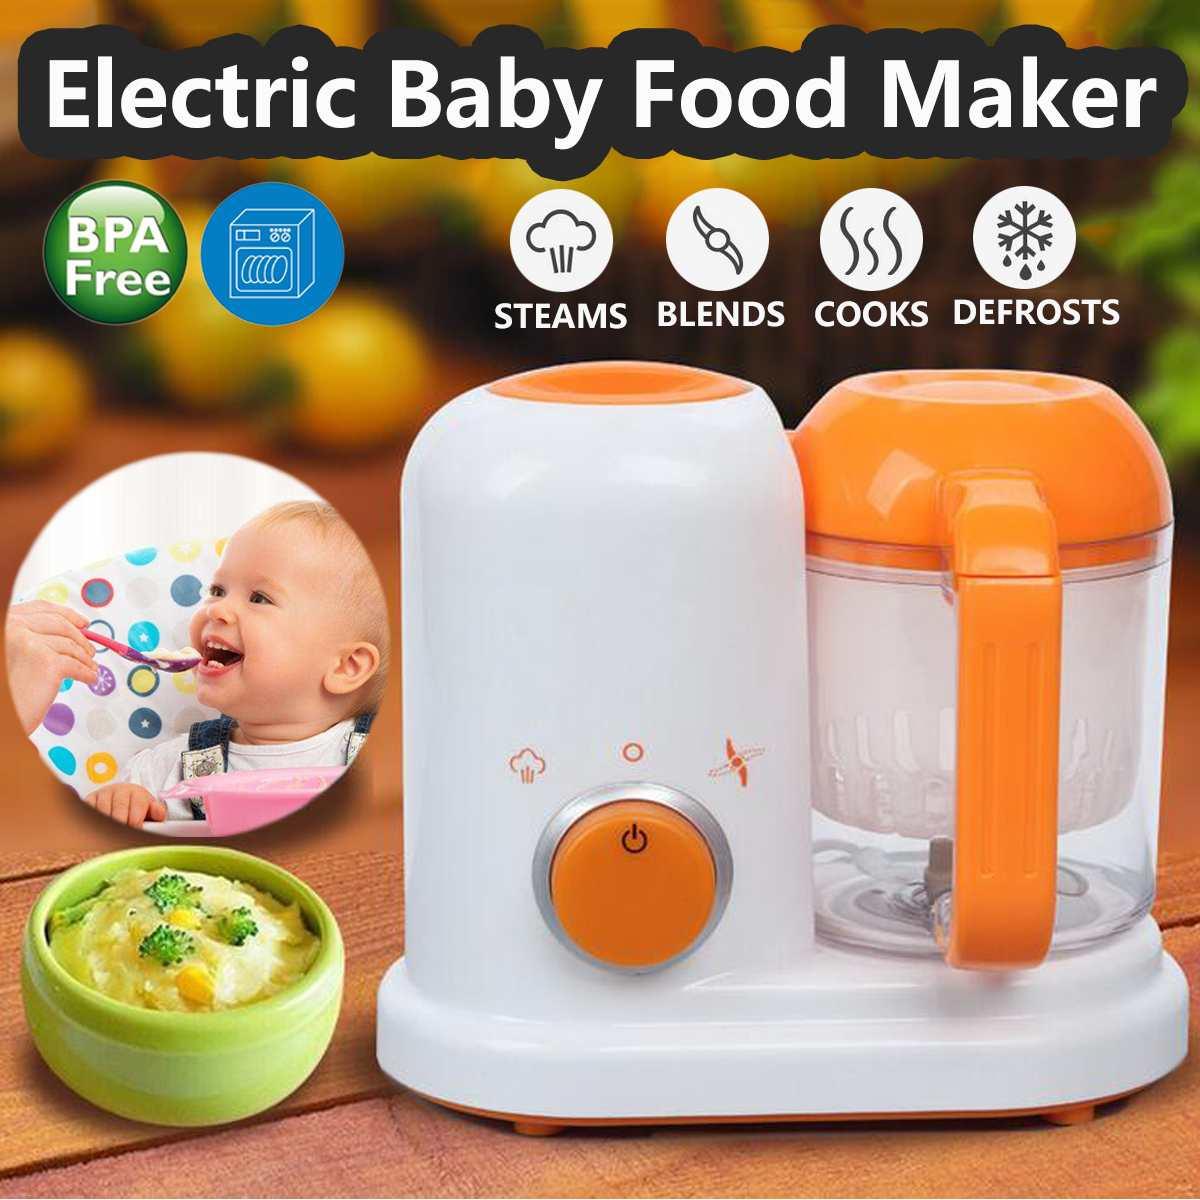 Electric Baby Food Maker AC 200-250V Toddler Blenders Steamer Processor BPA Free All In One Food-Graded PP EU Steam Food Safe